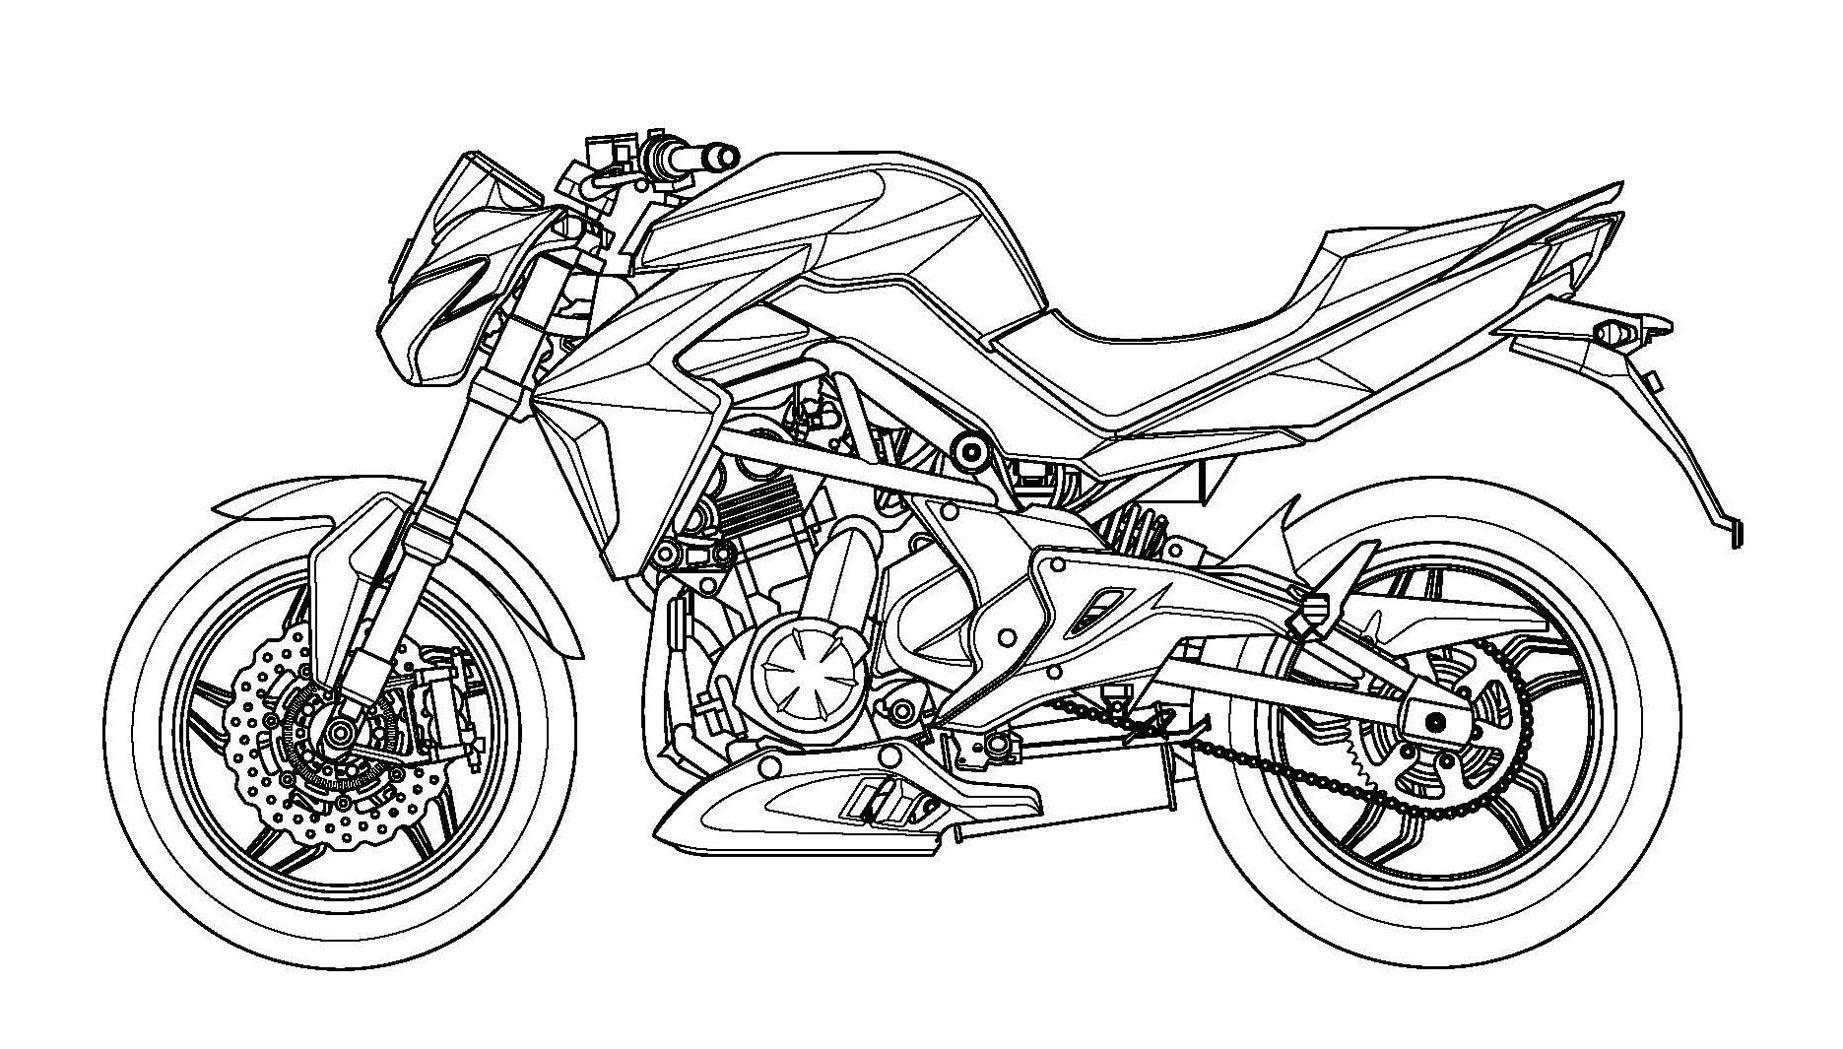 082216-Kymco-Er6N-07 | Bike | Drawings, Adult Coloring, Art destiné Dessin De Moto Ktm